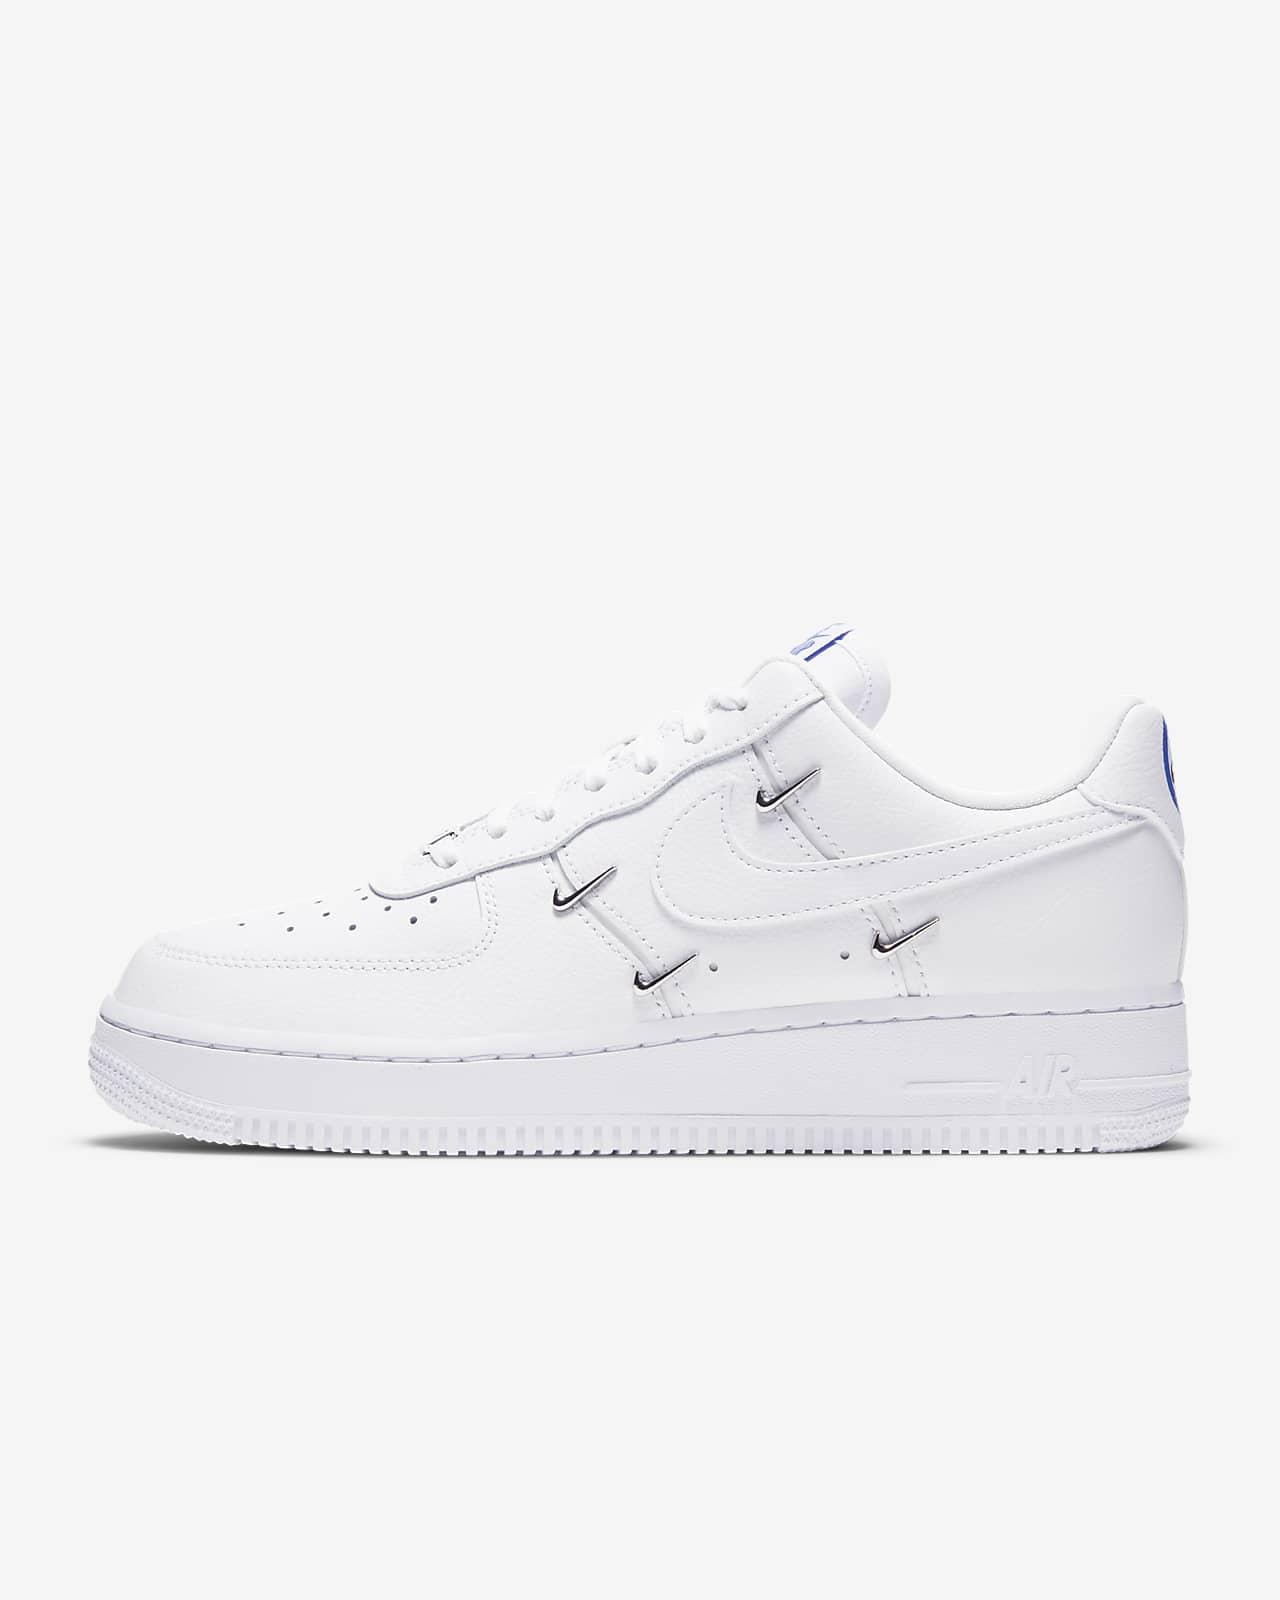 Nike Air Force 1 '07 LX 女子运动鞋